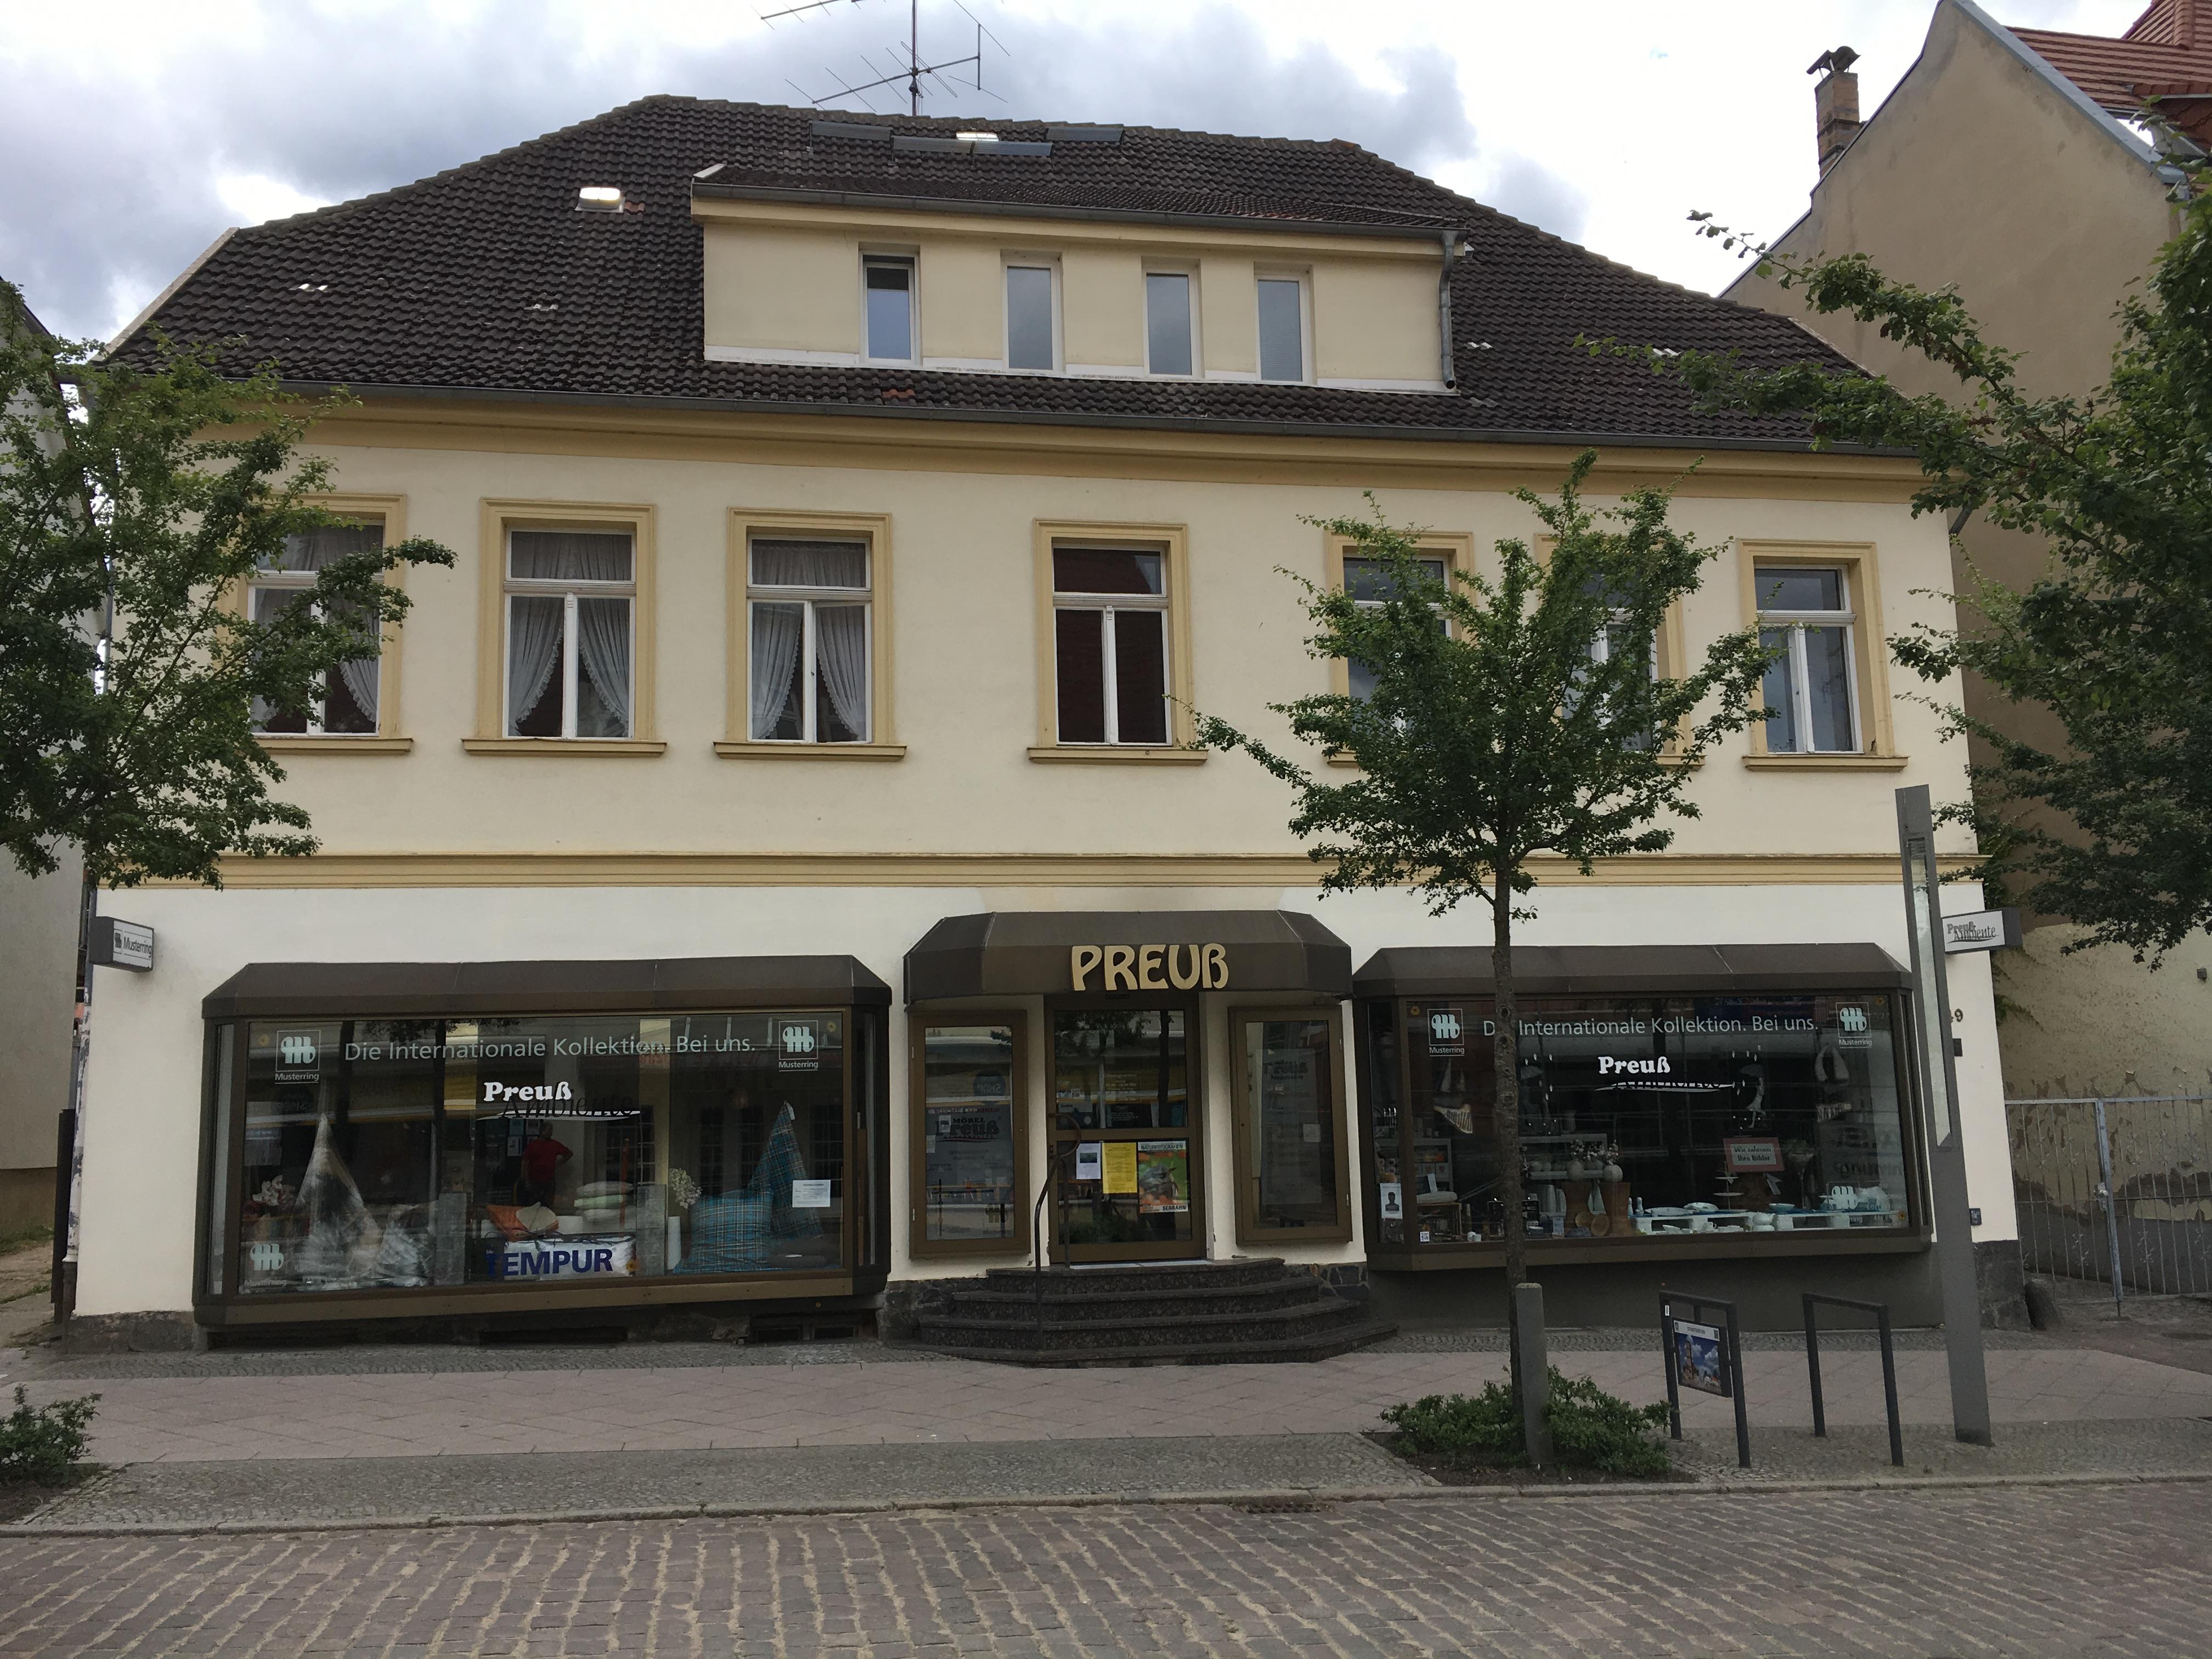 Strelitzer Straße 49